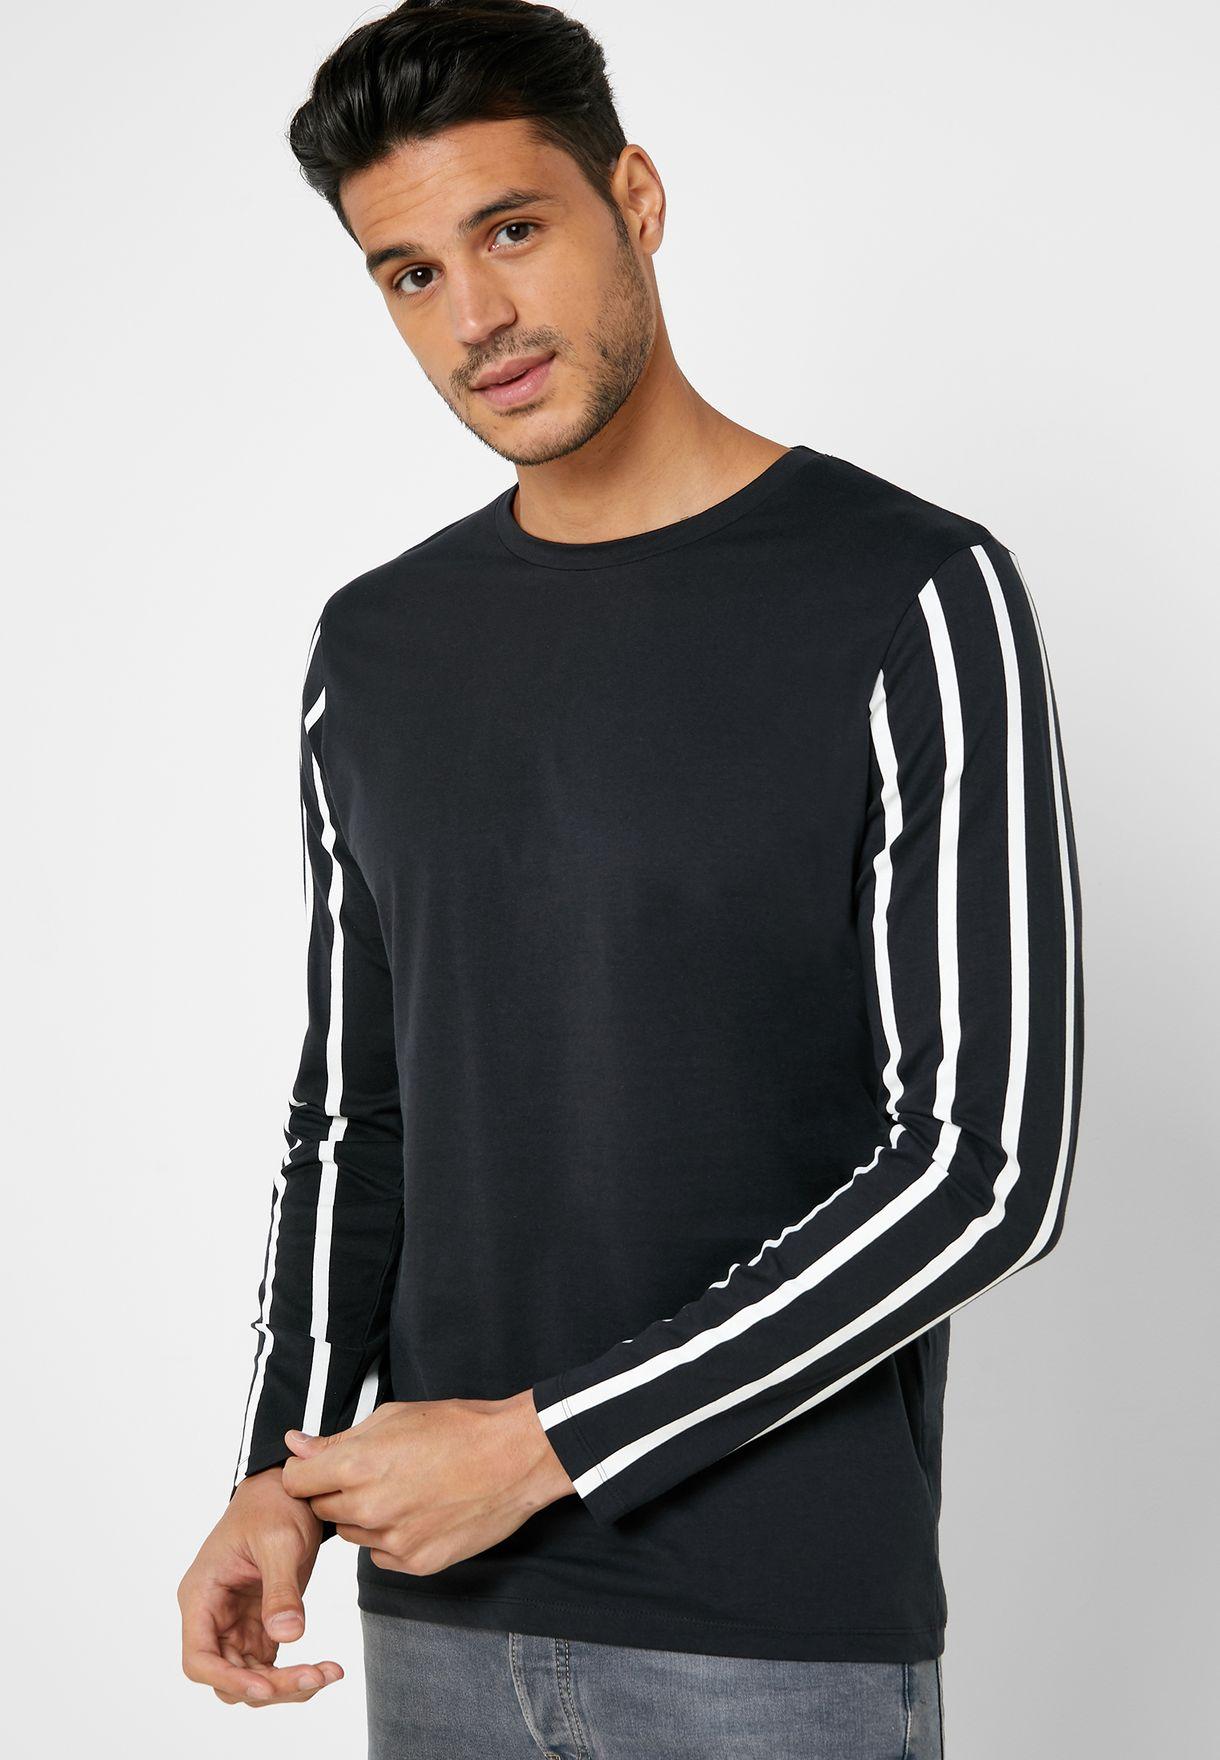 Loud Regular Fit Crew Neck T-Shirt